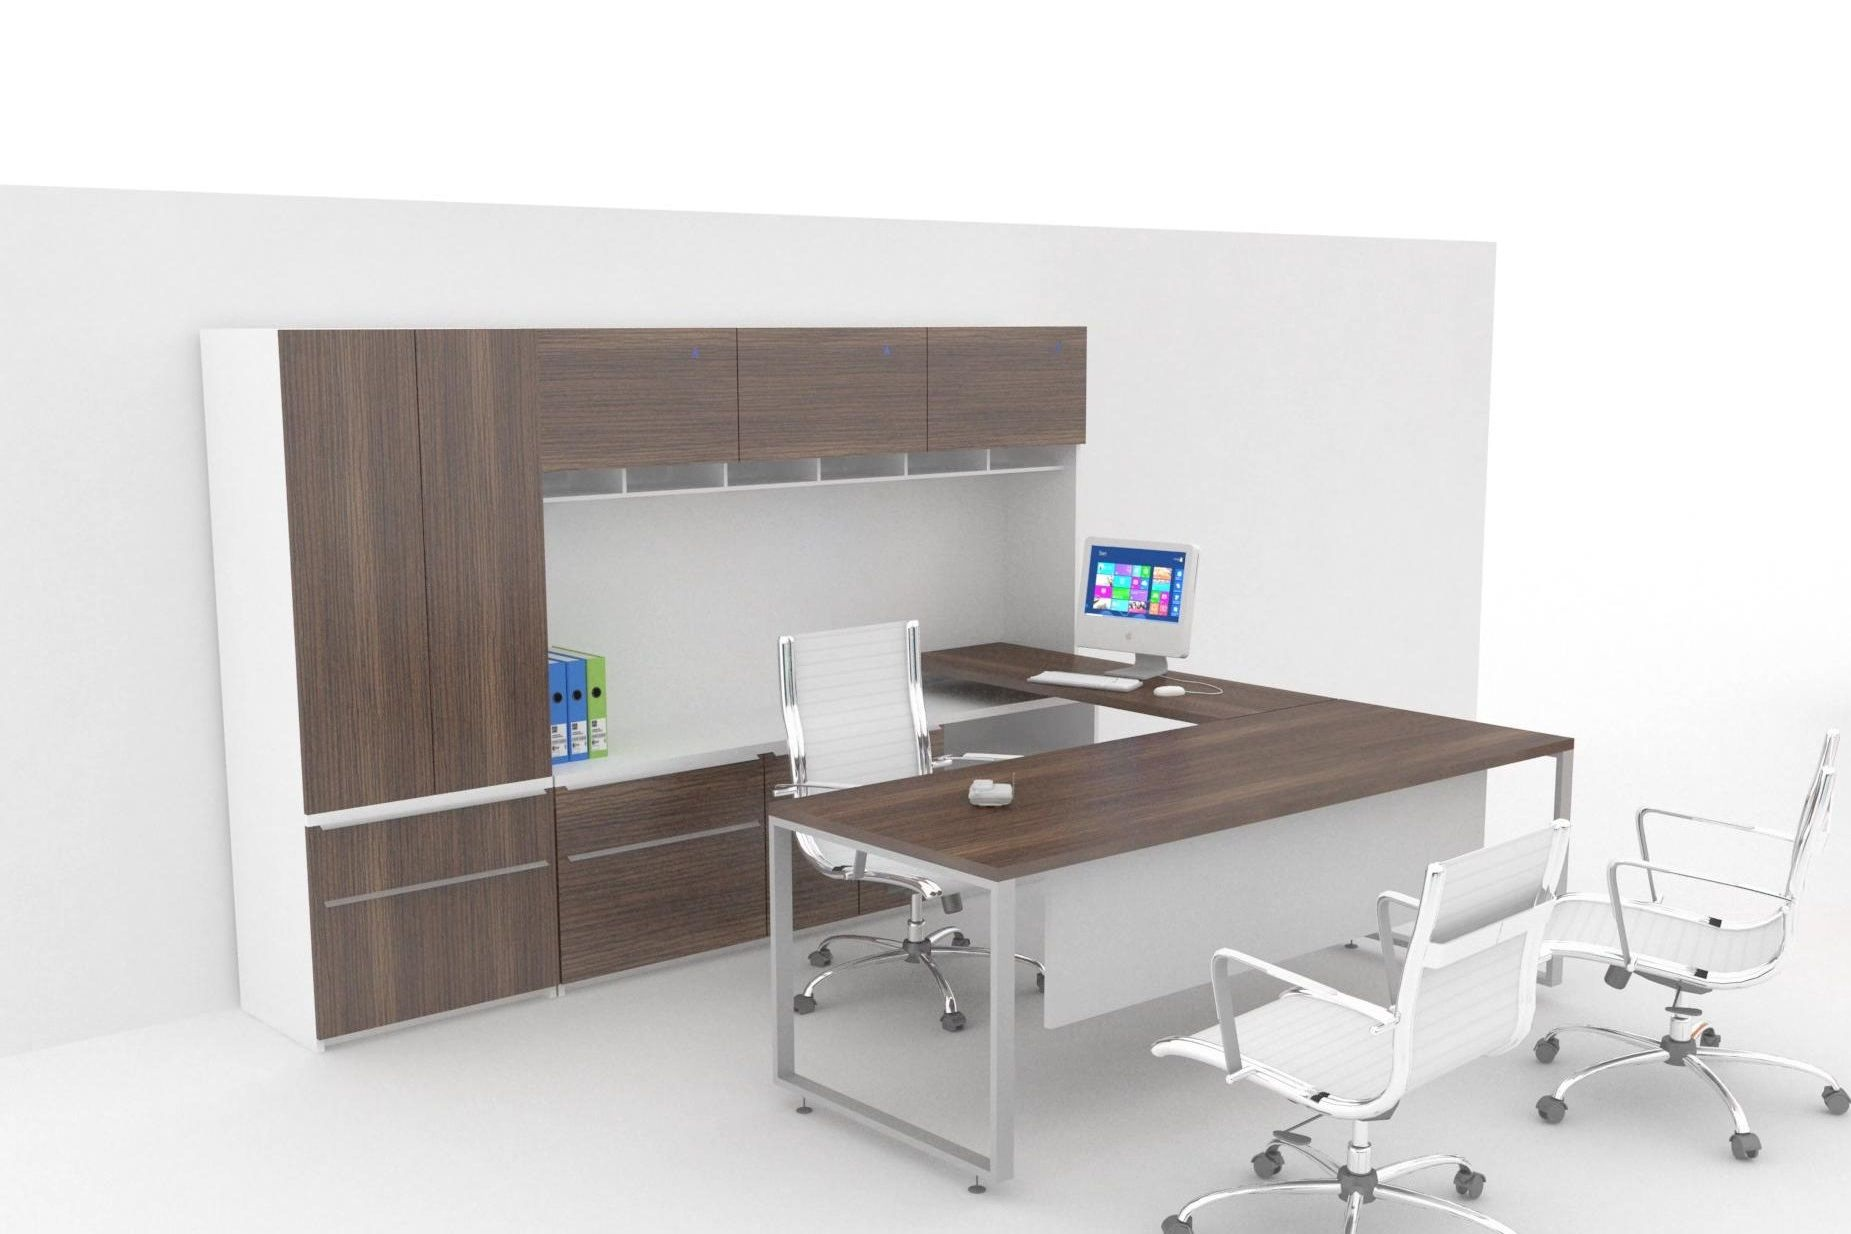 Escritorios de oficina - Línea Skand - Muebles para oficina ...